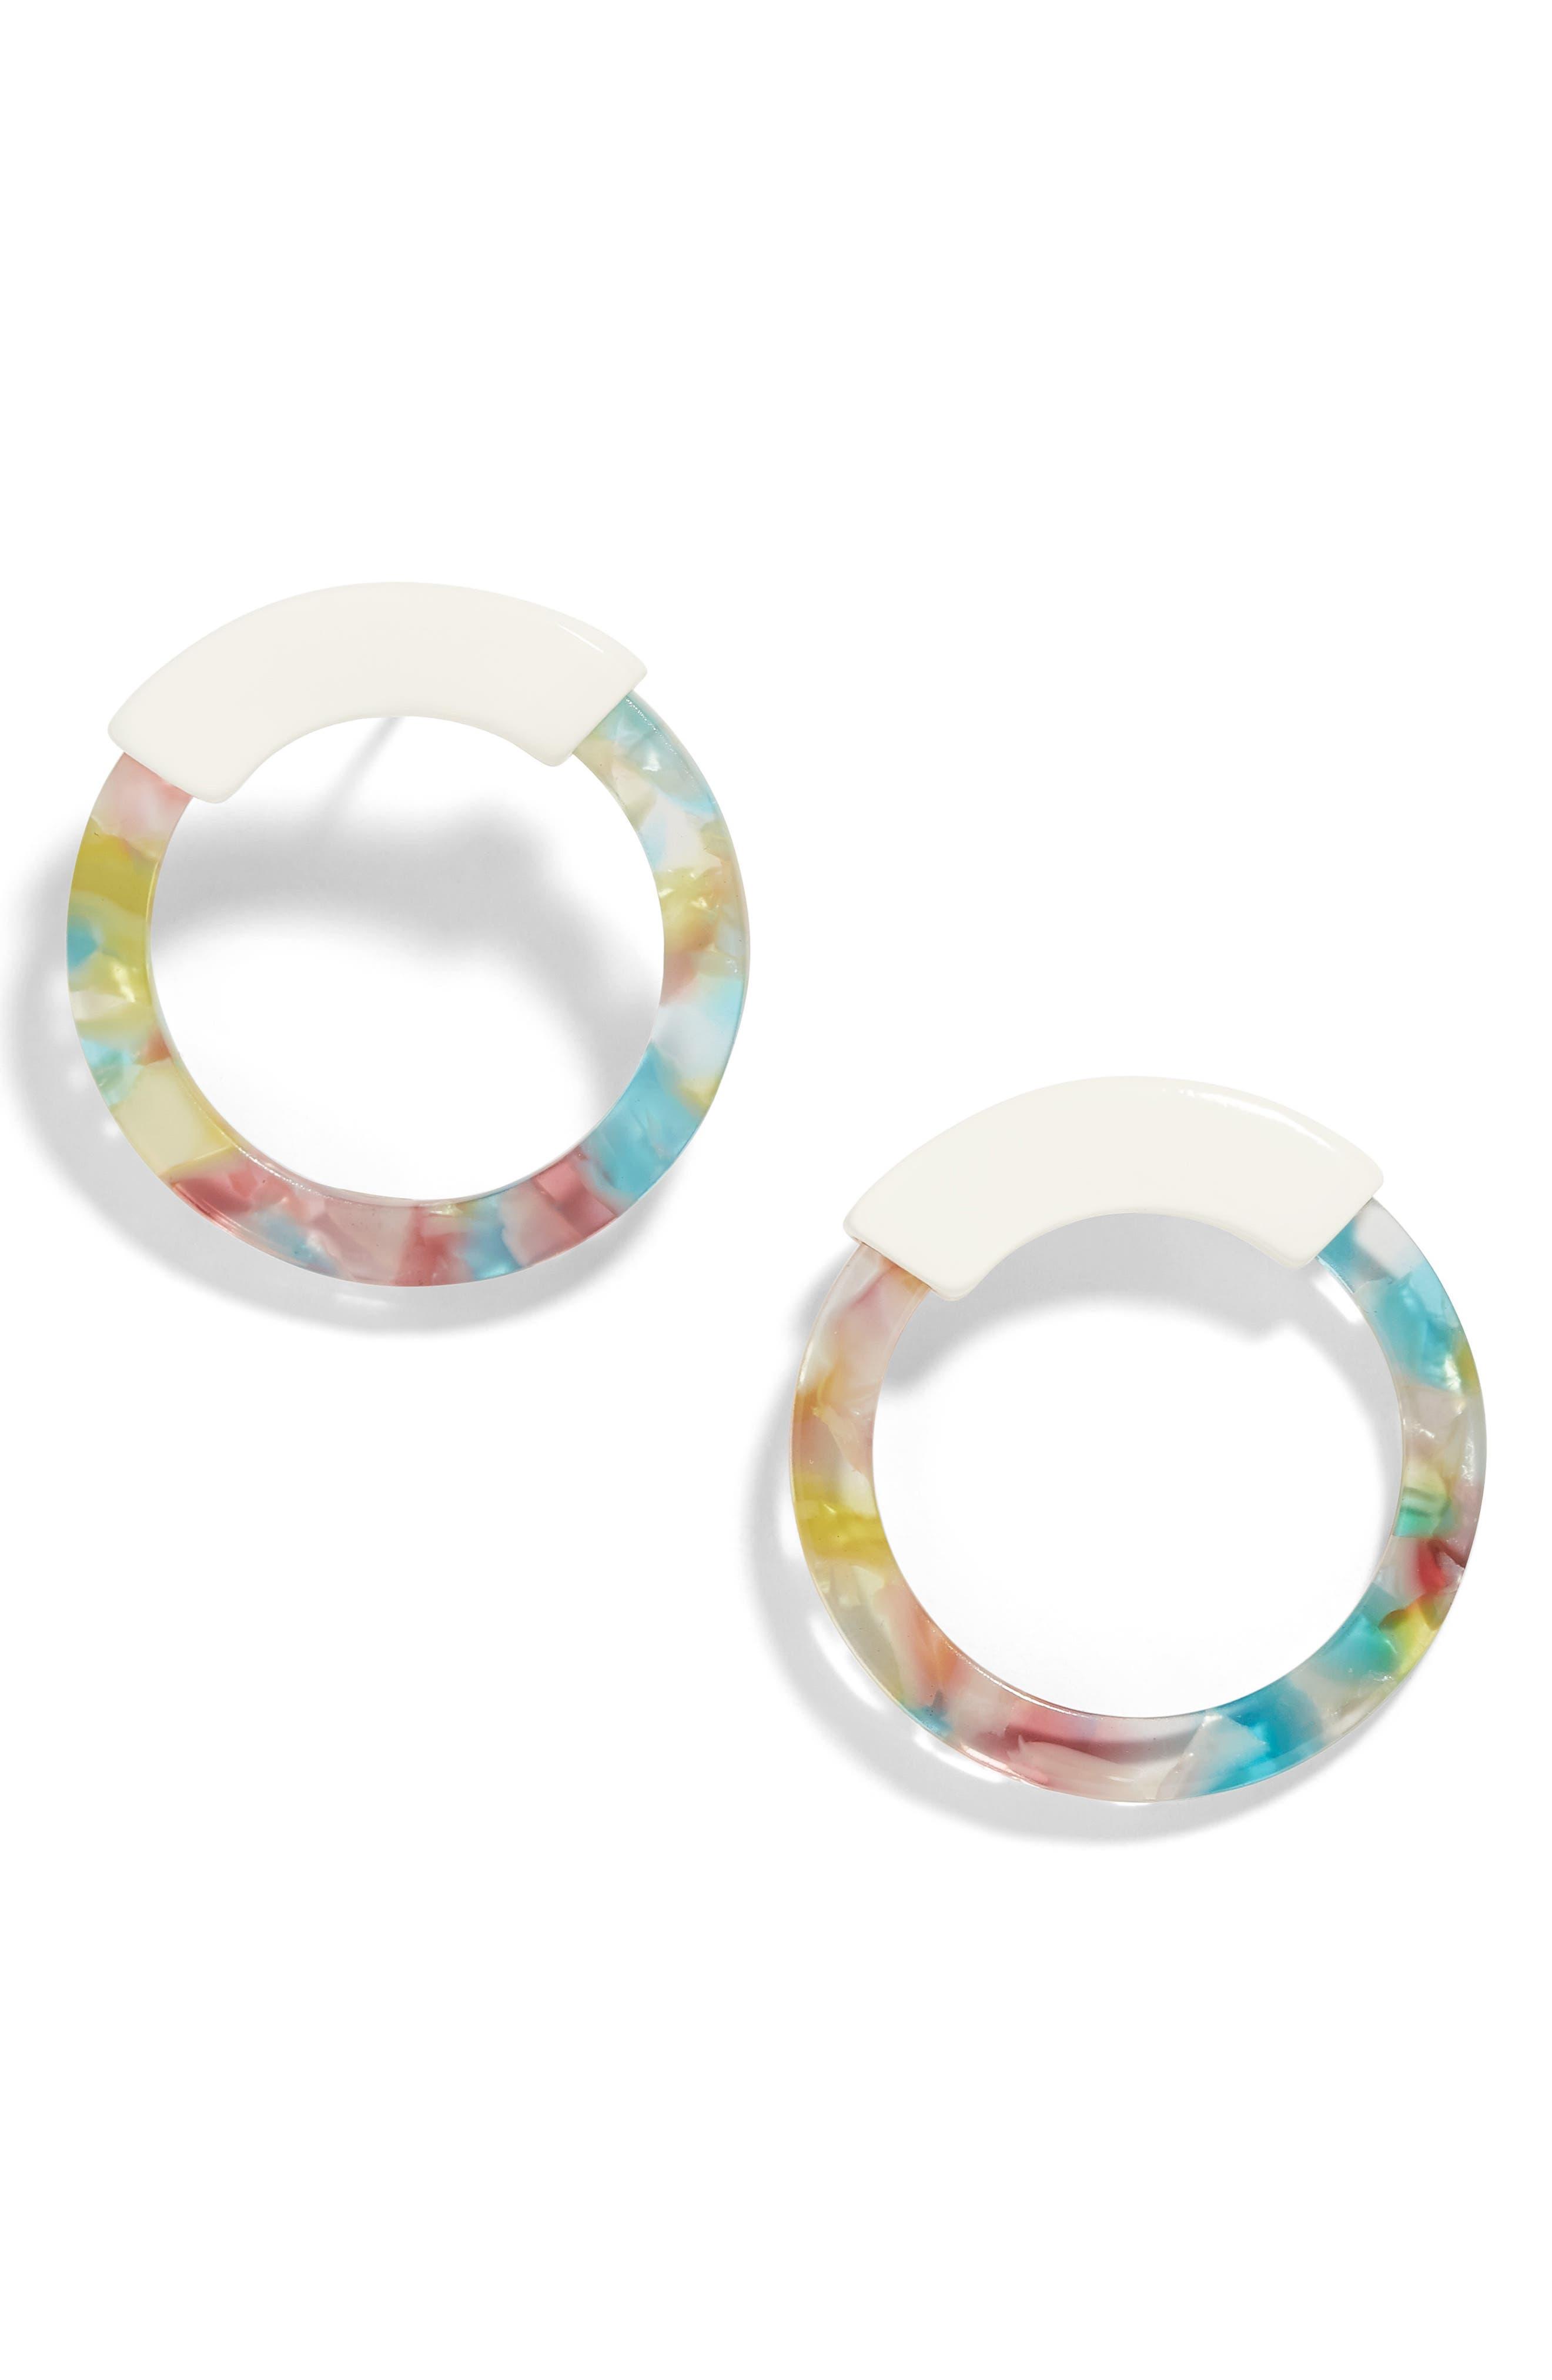 DeAnn Resin Hoop Earrings,                             Main thumbnail 1, color,                             100